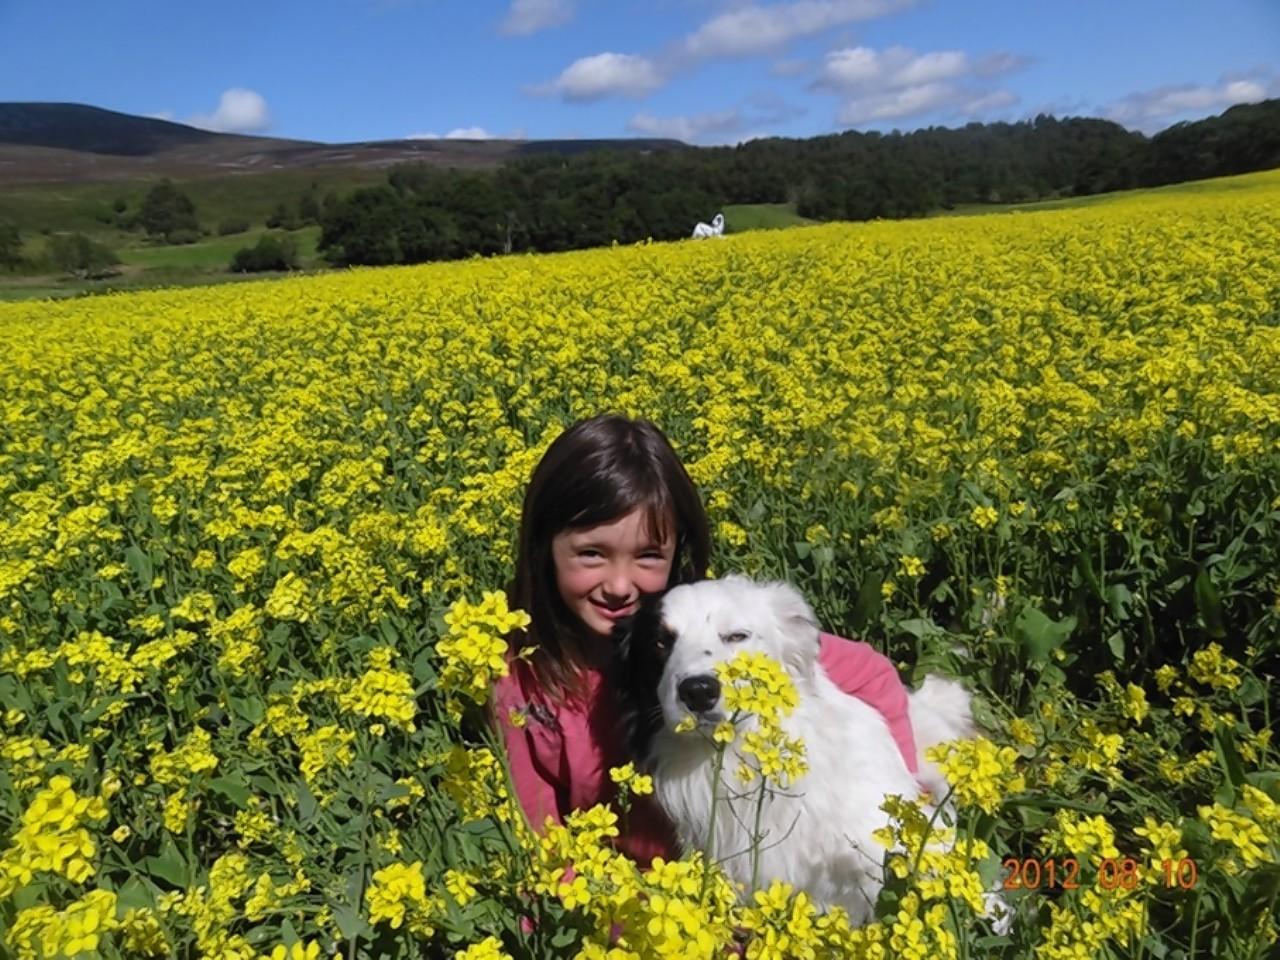 Adele Irvine with her beloved sheepdog Chubs